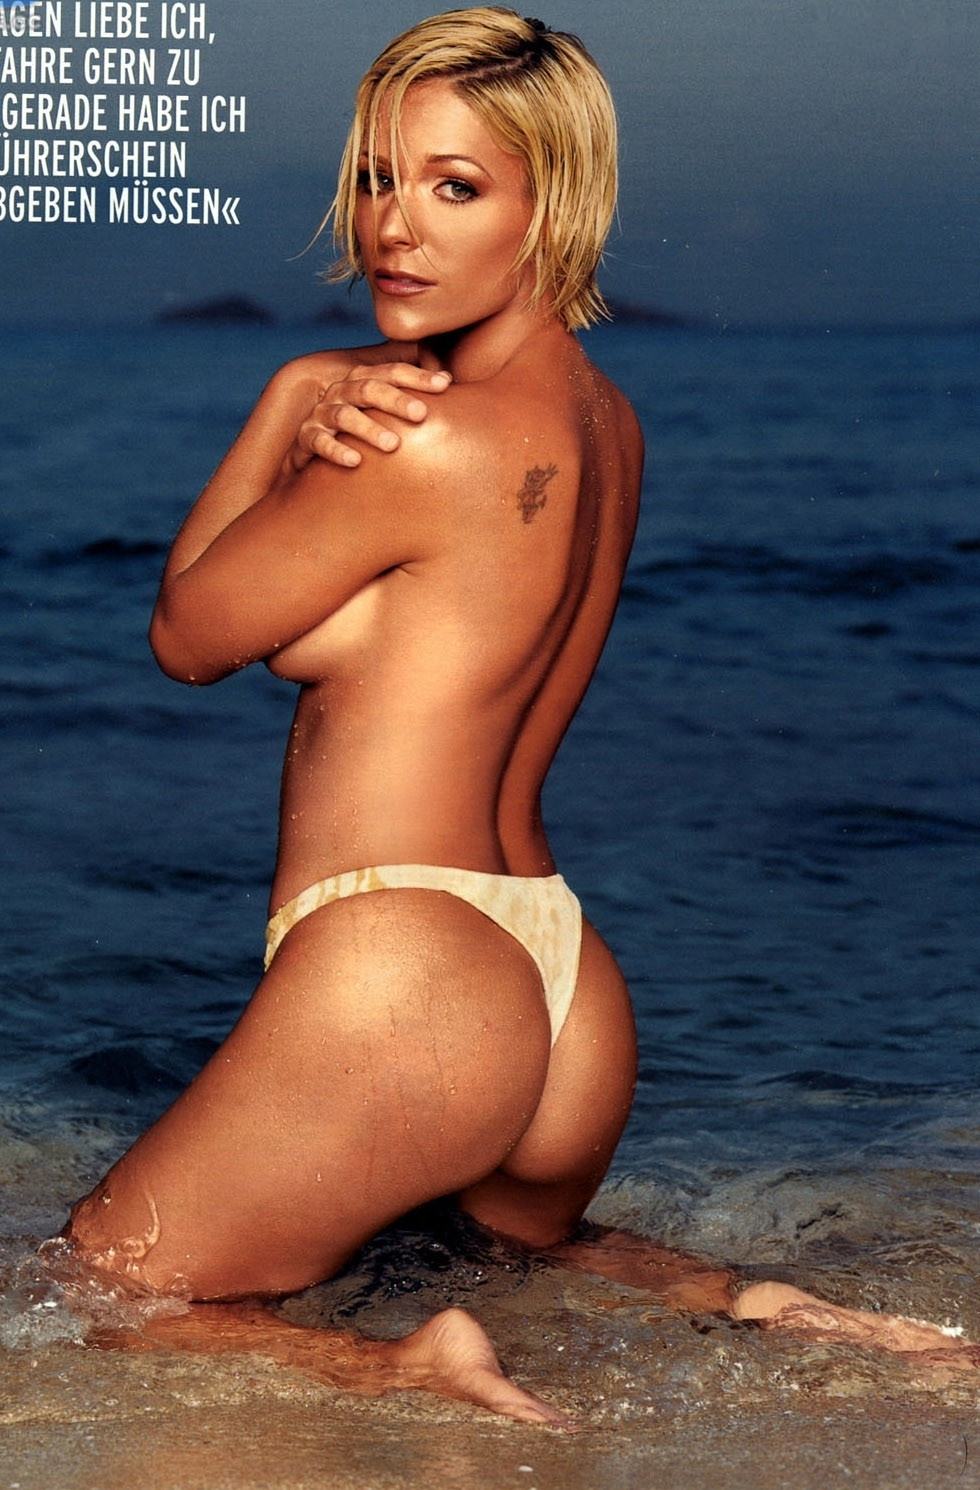 Мишель (Таня Хьюер) голая. Фото - 12